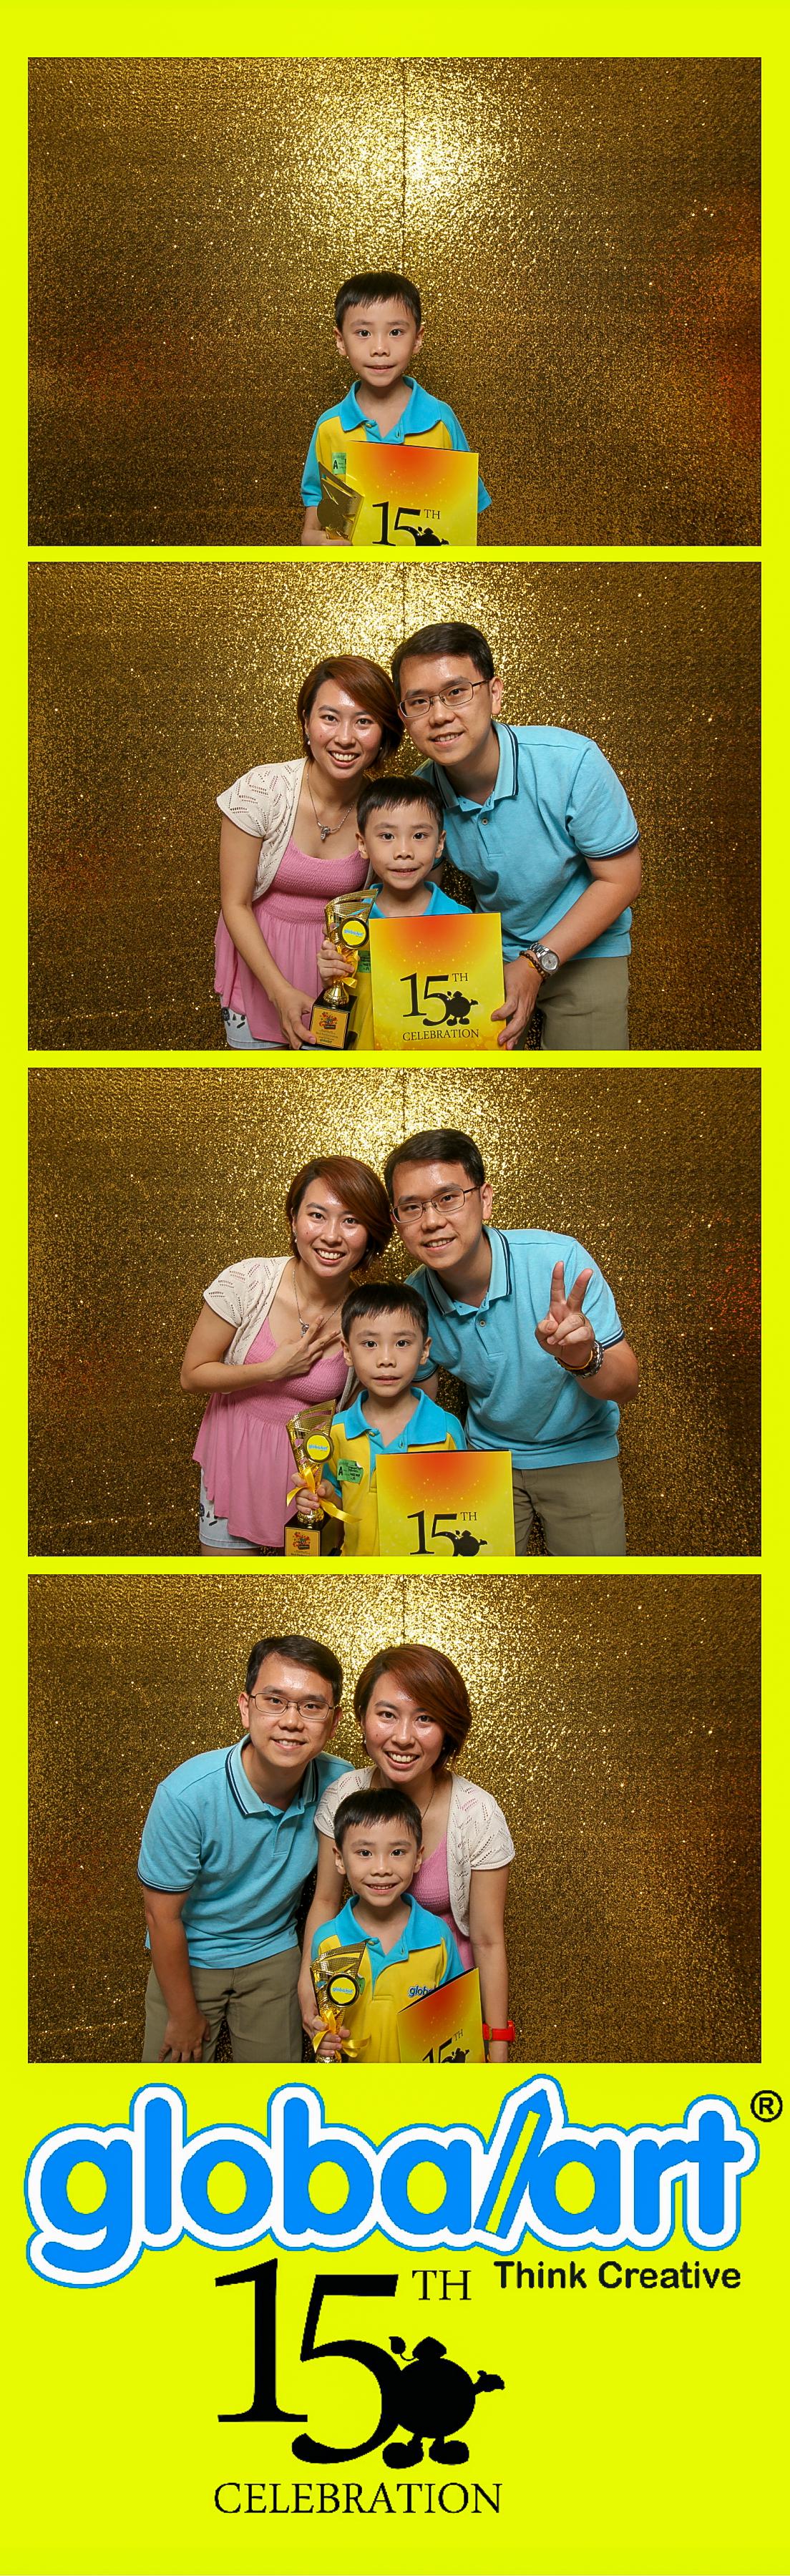 global art photo booth singapore (9)